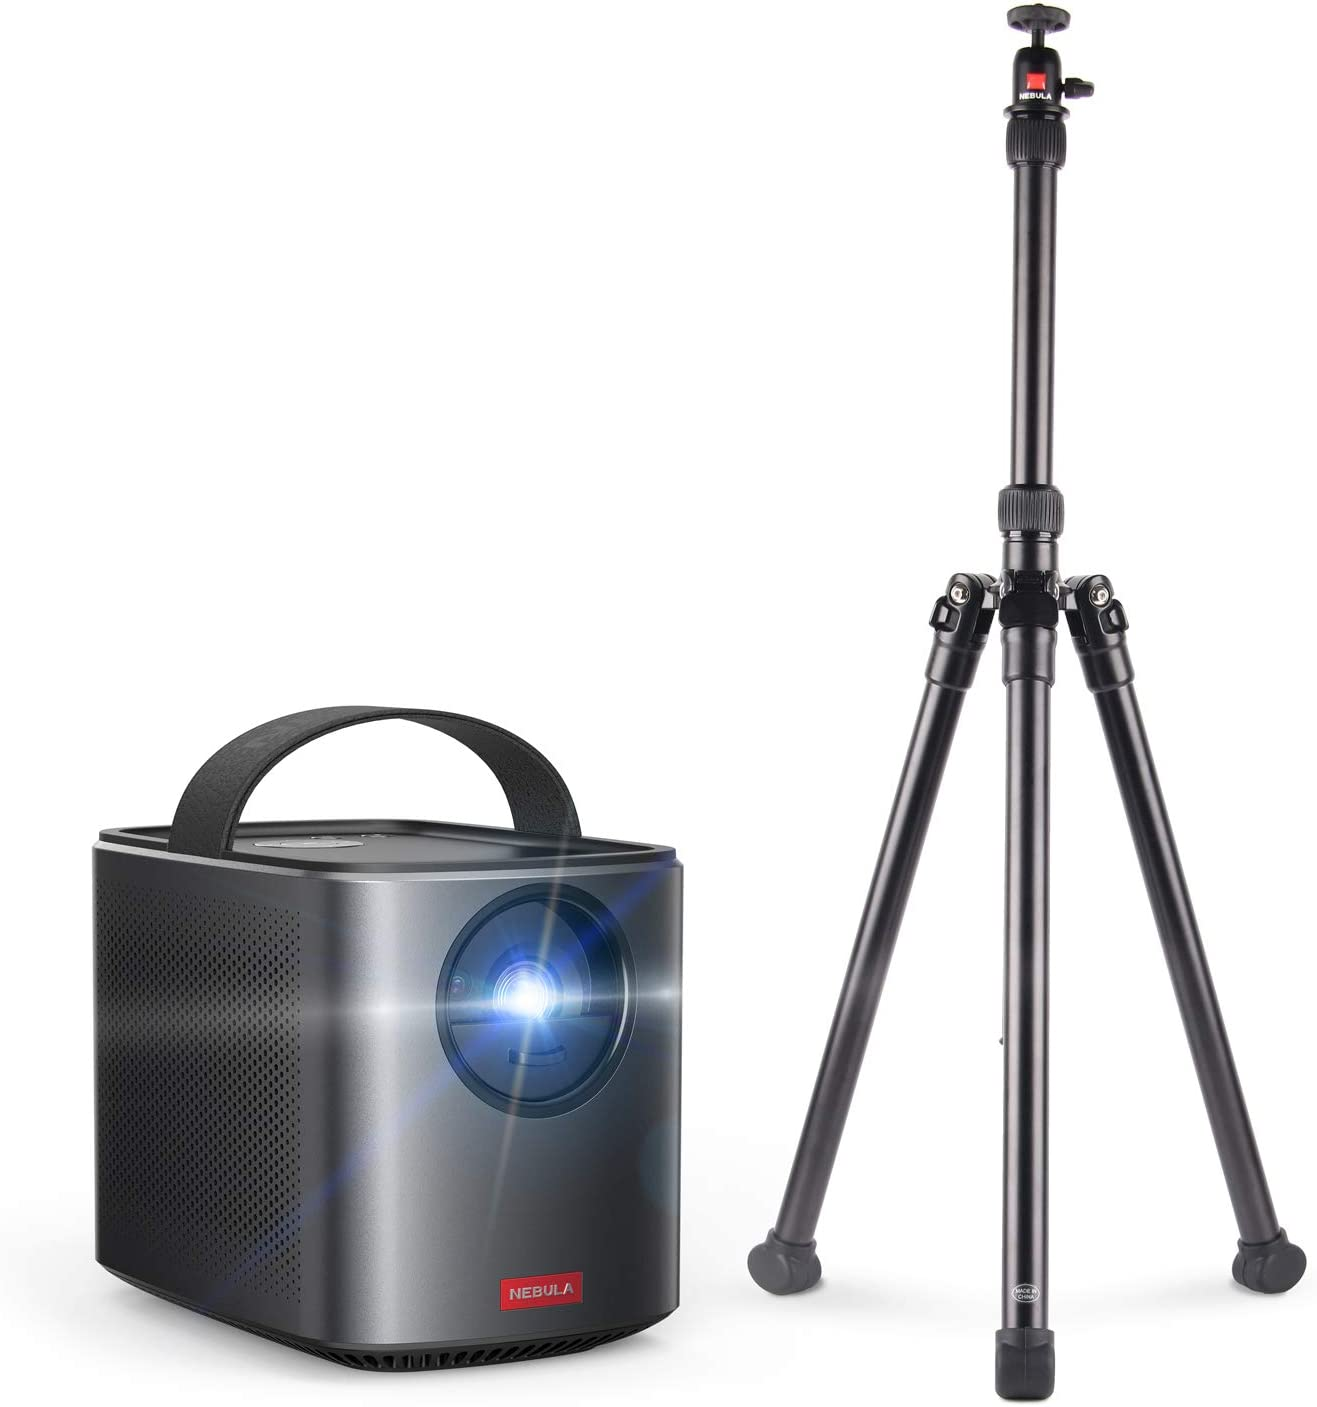 Nebula by Anker Mars II Pro 500 ANSI Lumen Portable Projector with Anker Nebula Mars 2 Universal Tripod 3 Feet Black – Tripods